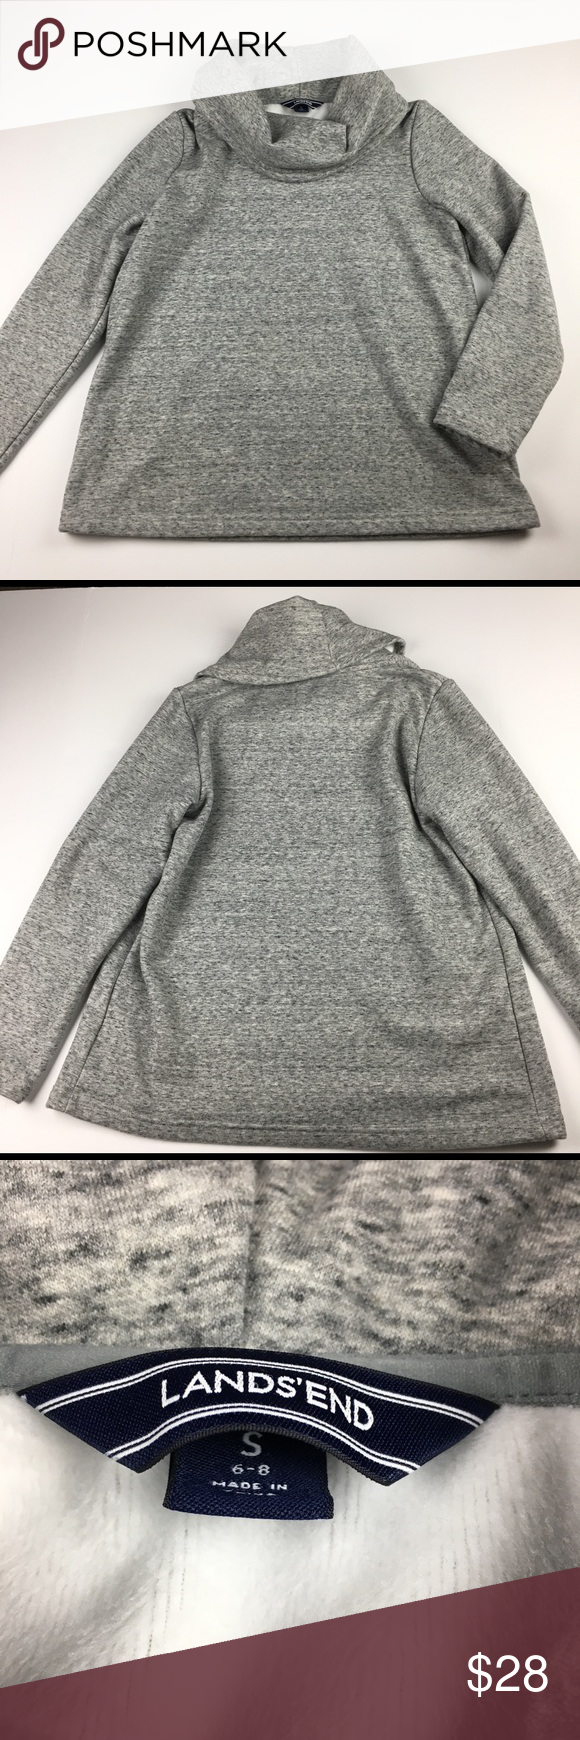 Lands End Gray Cowl Neck Fleece Lined Sweatshirt Chest Measures 20 Across Length 26 Lands End Tops Sweatshirts Hood Grey Cowl Sweatshirt Tops Sweatshirts [ 1740 x 580 Pixel ]